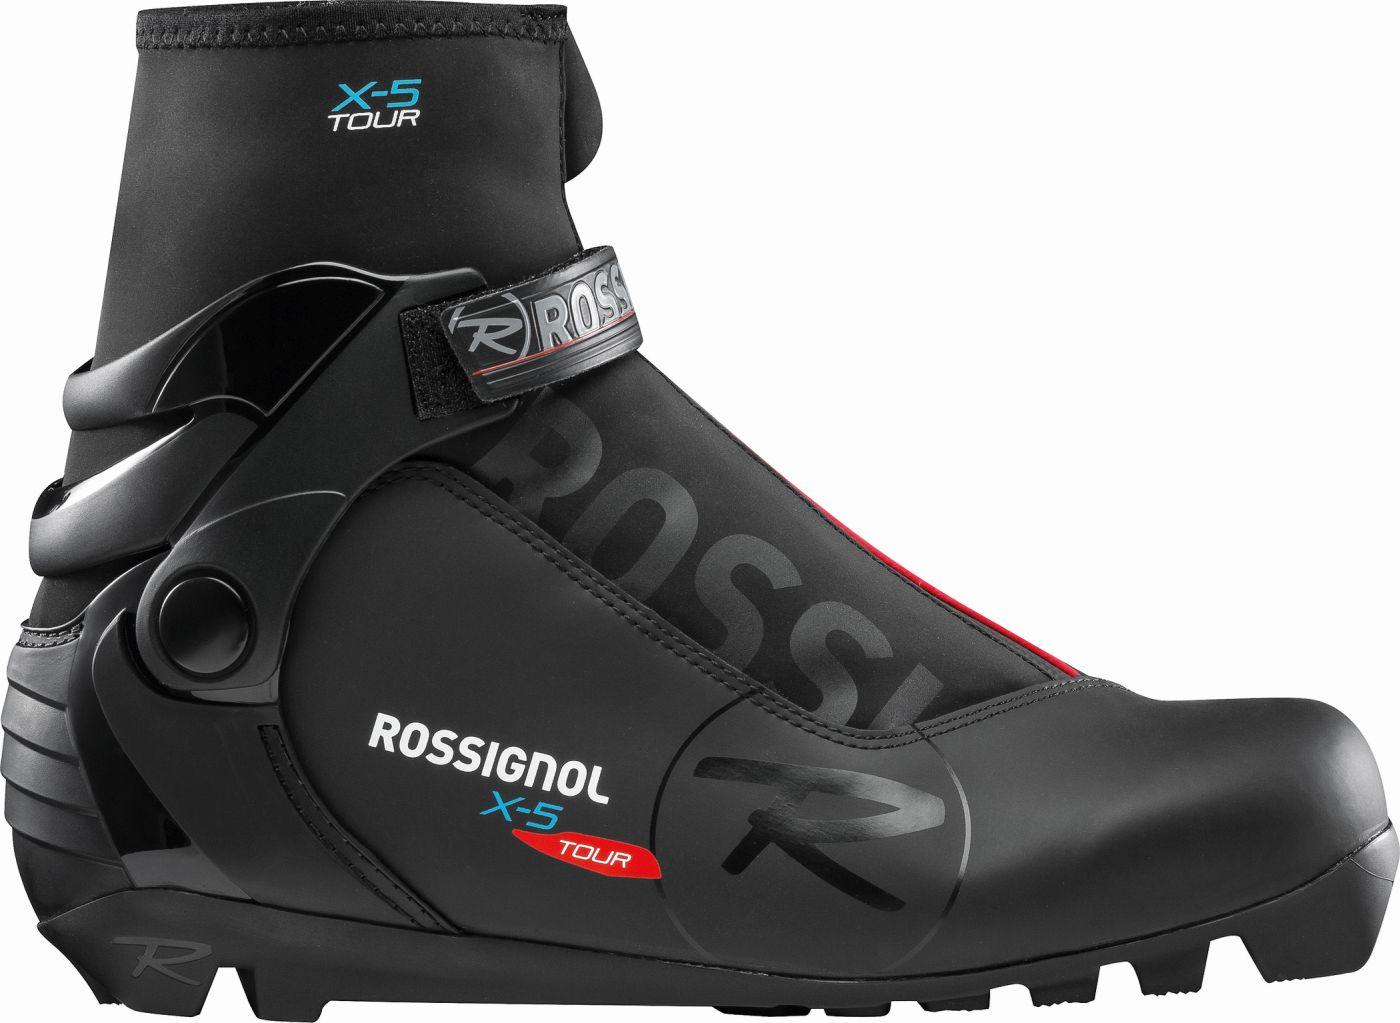 1b43730661fa0 Rossignol eshop - Bežecká obuv: X-5